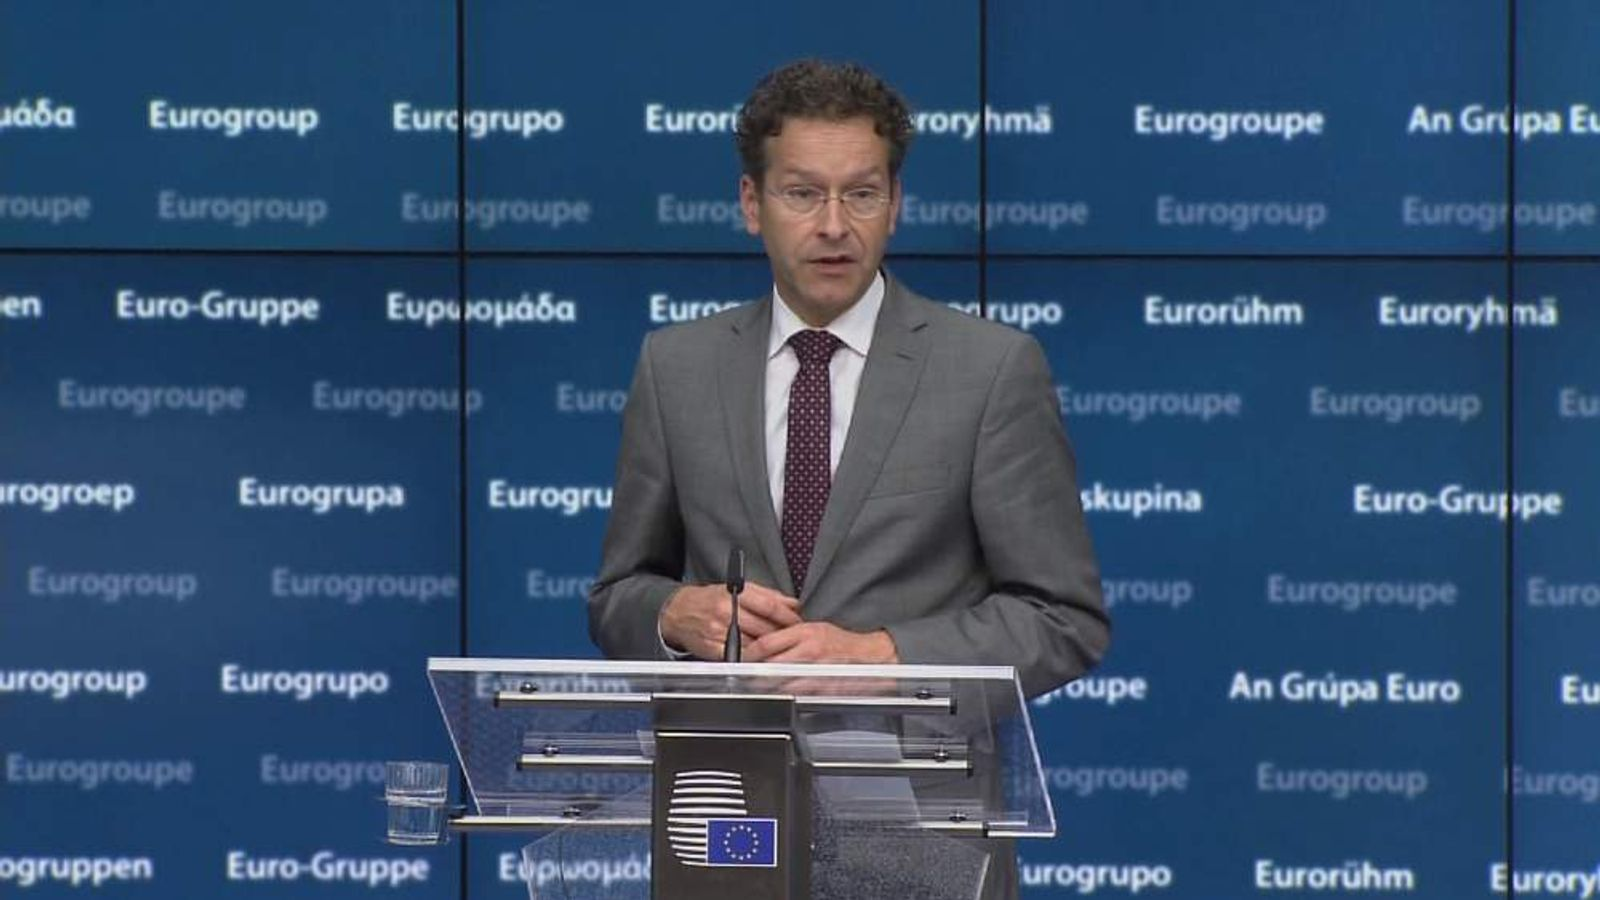 Eurogroup President Jeroen Dijisselbloem